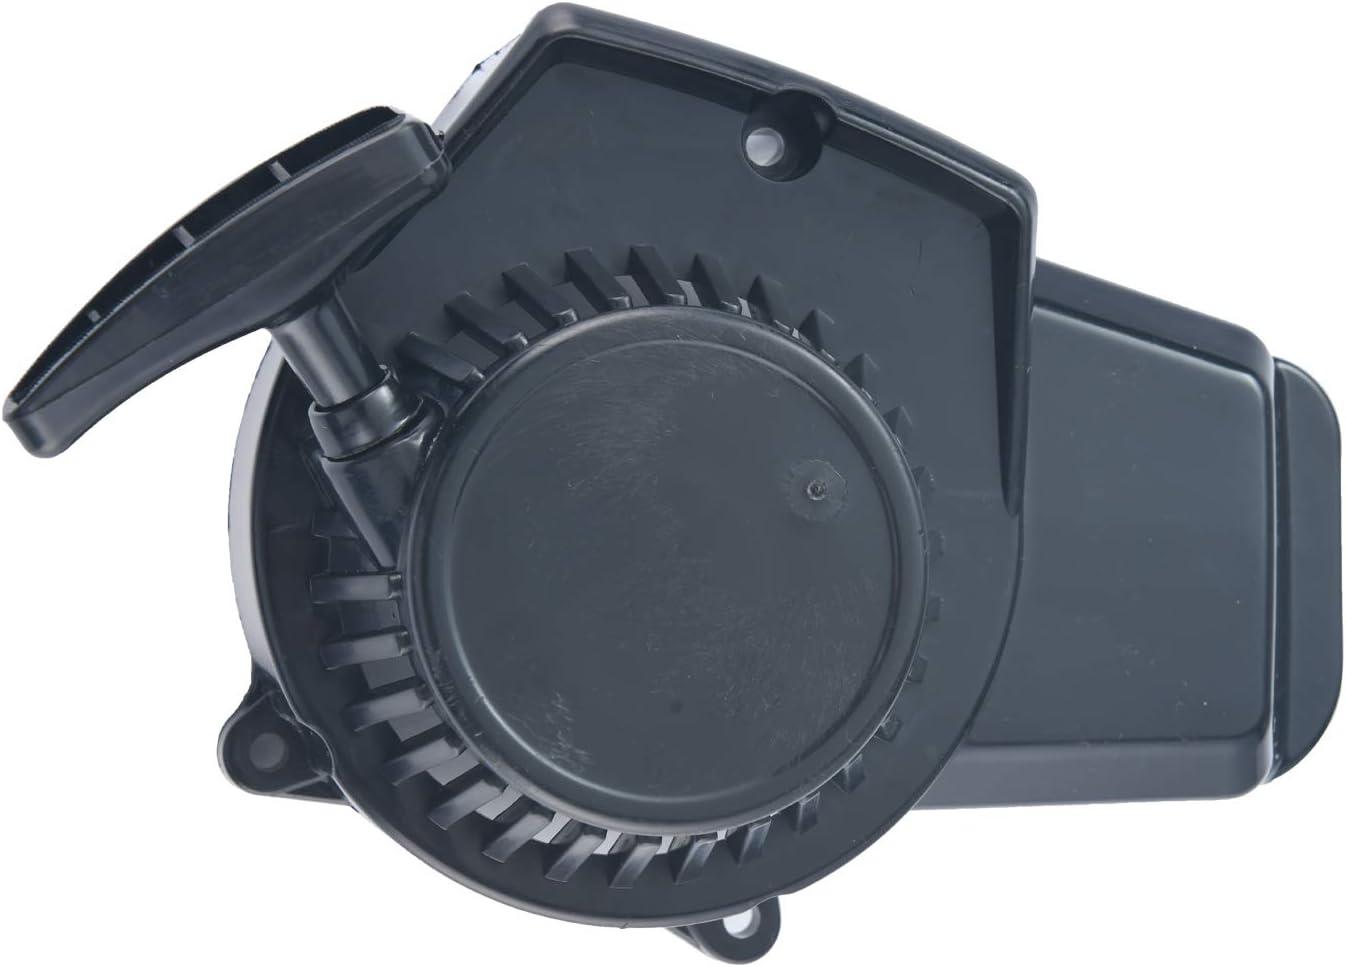 CLEO Easy Pull Start for 2 Stroke Engine 33cc 43cc 47cc 49cc 2 Stroke Mini Pocket Dirt Bike ATV Quad